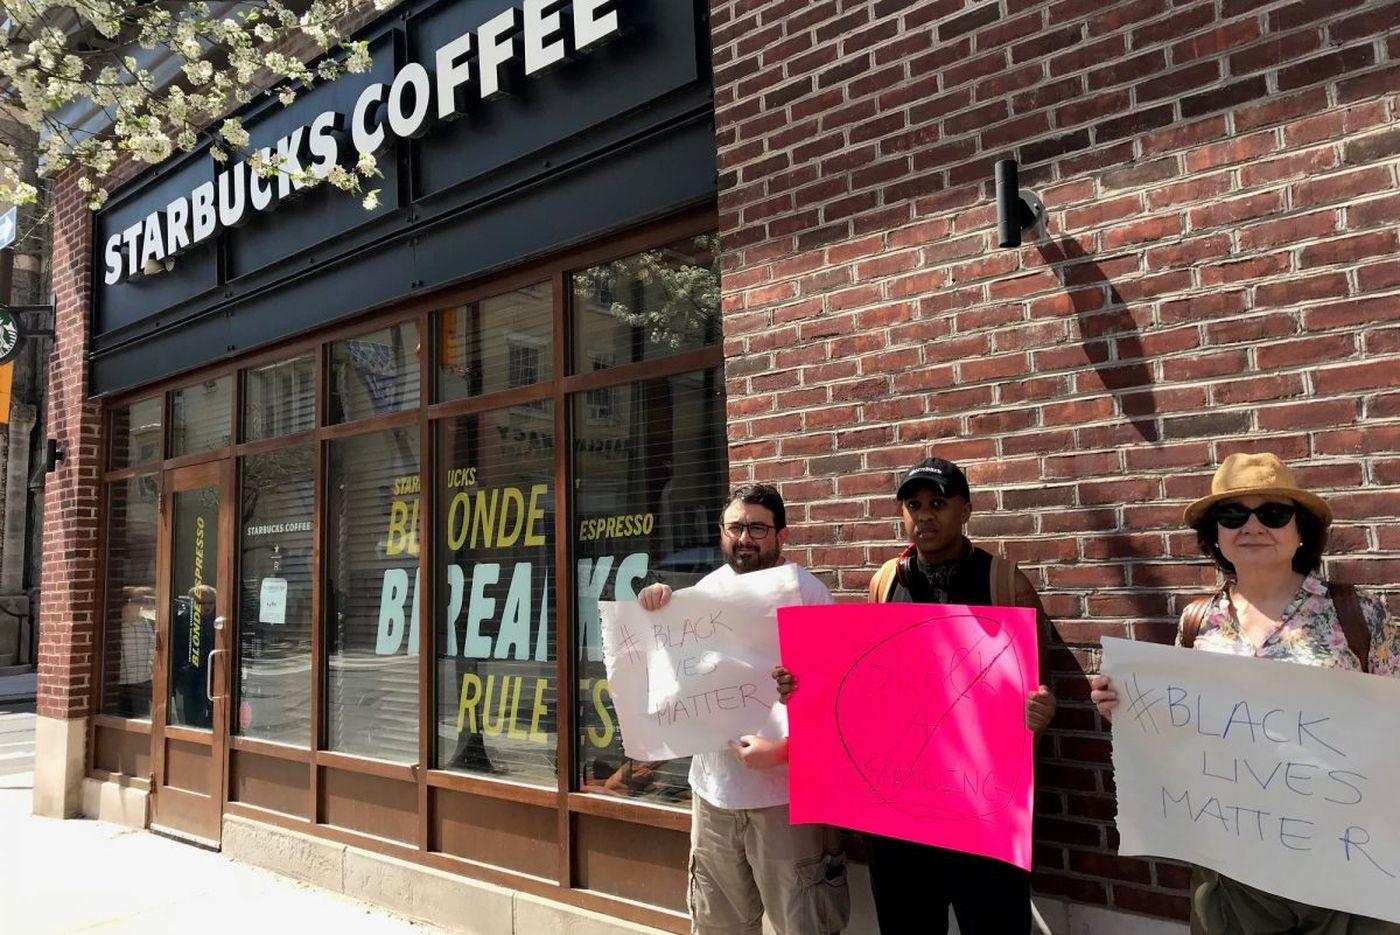 Black men's arrests at Philadelphia Starbucks prompt city probes amid national outcry